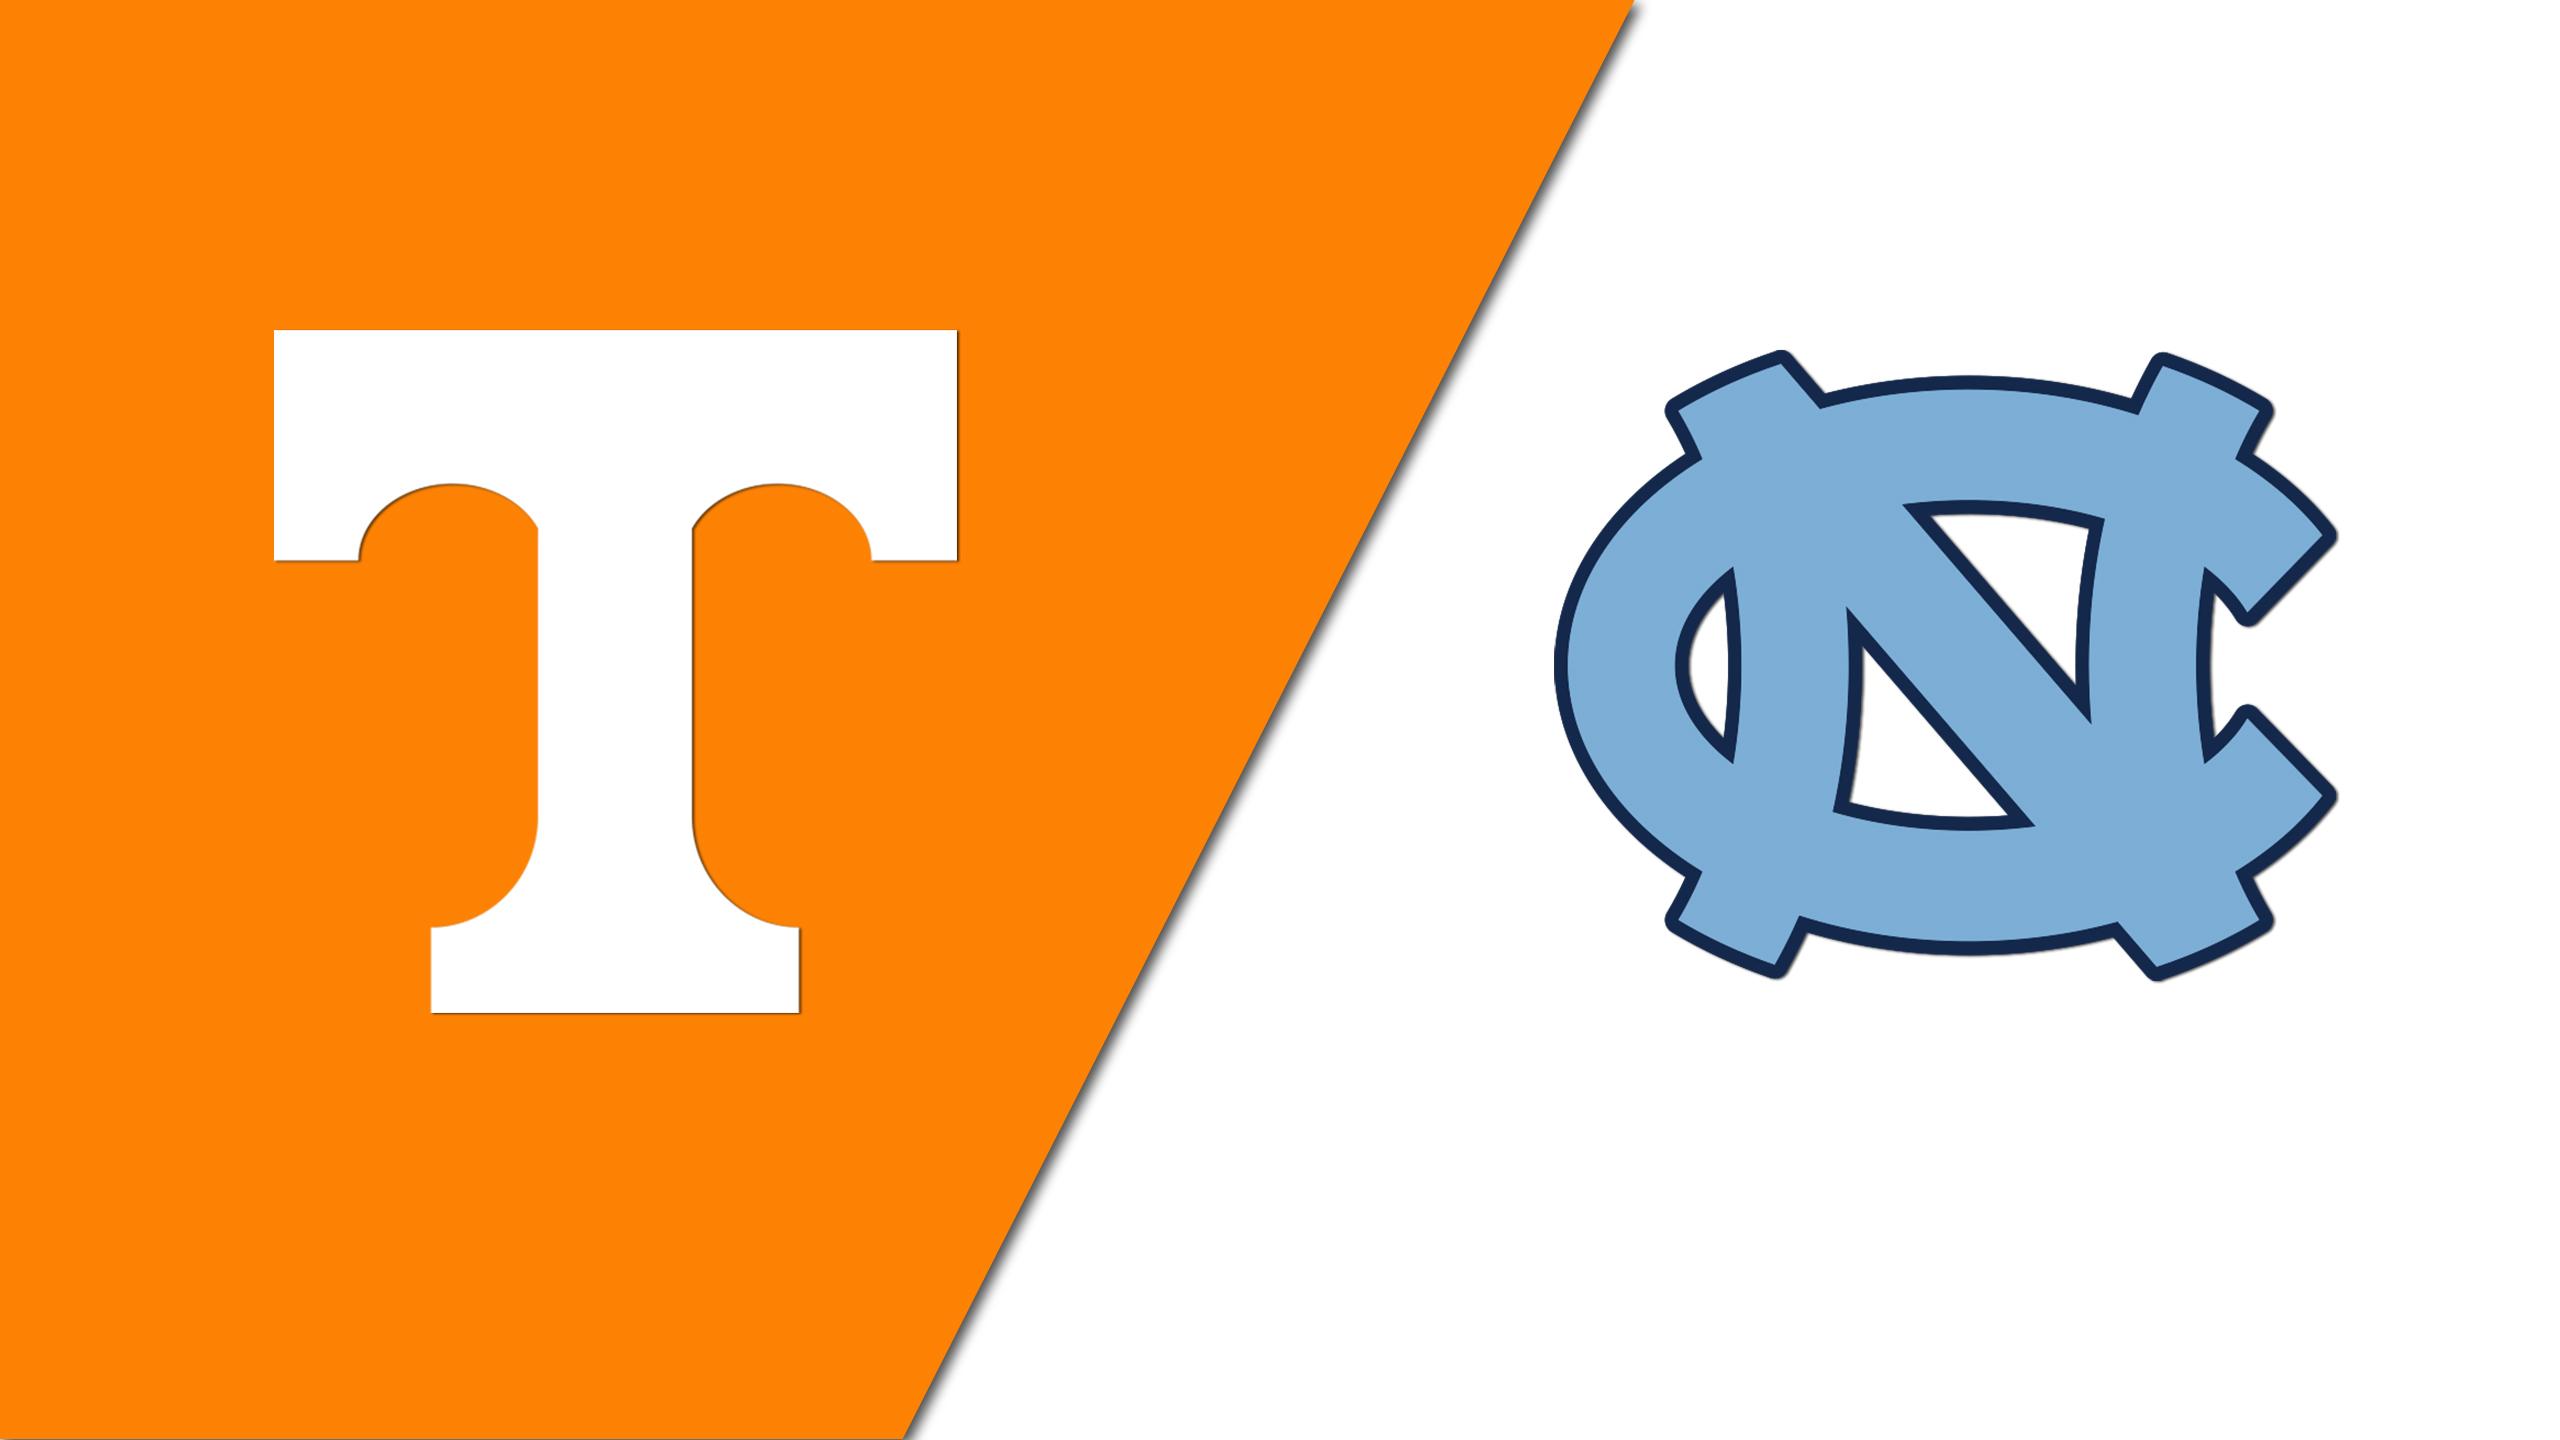 Tennessee vs. North Carolina (Site 14 / Game 6)